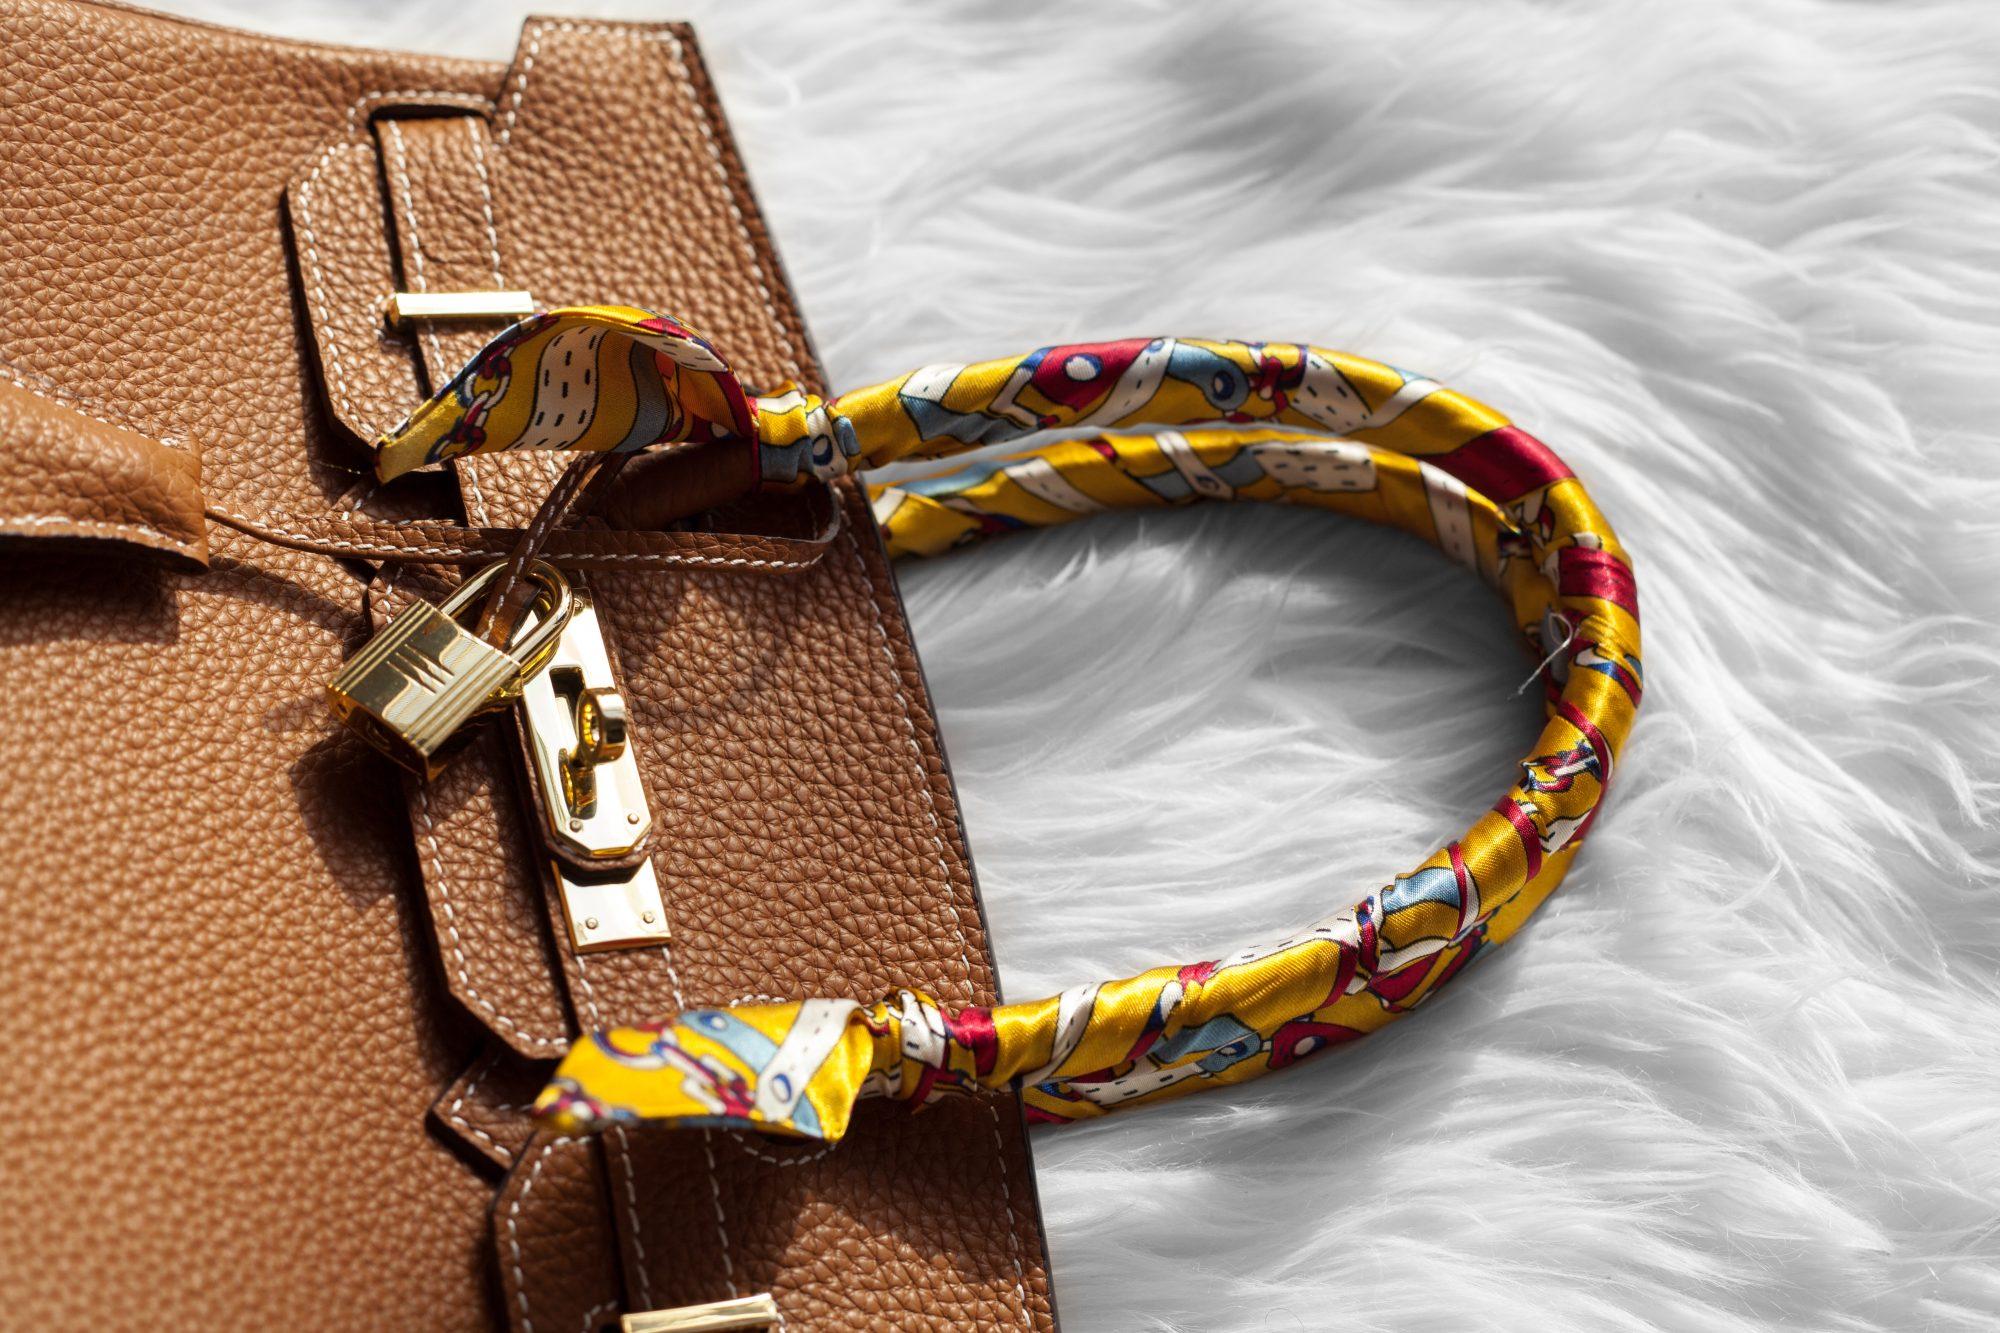 fbc3b468e5cc This tan bag is a gorgeous designer dupe of the Hermés Birkin.